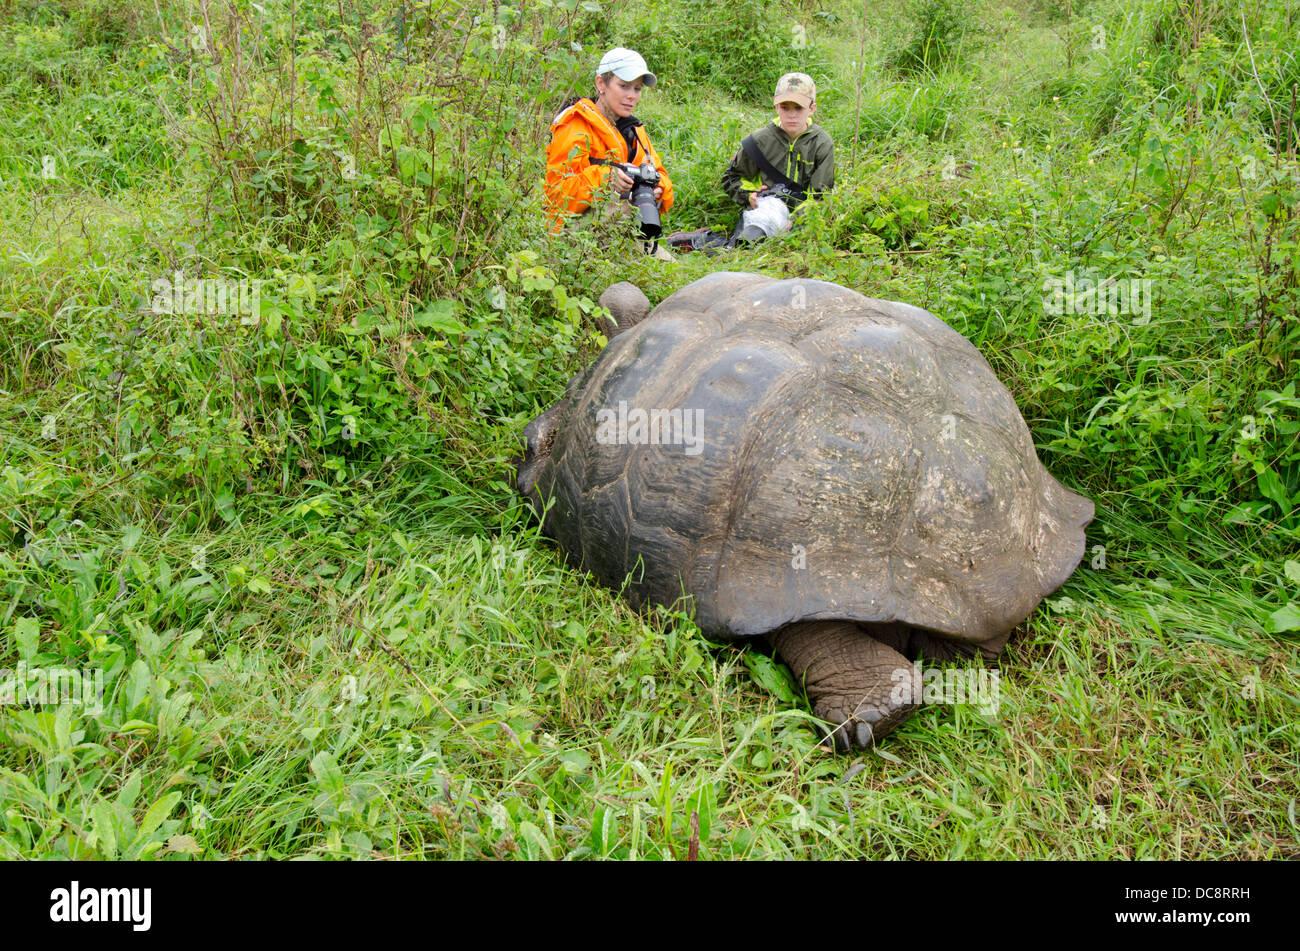 Ecuador, Galapagos, Santa Cruz highlands. Young photographers close to a Galapagos dome-shaped tortoise in grassy - Stock Image